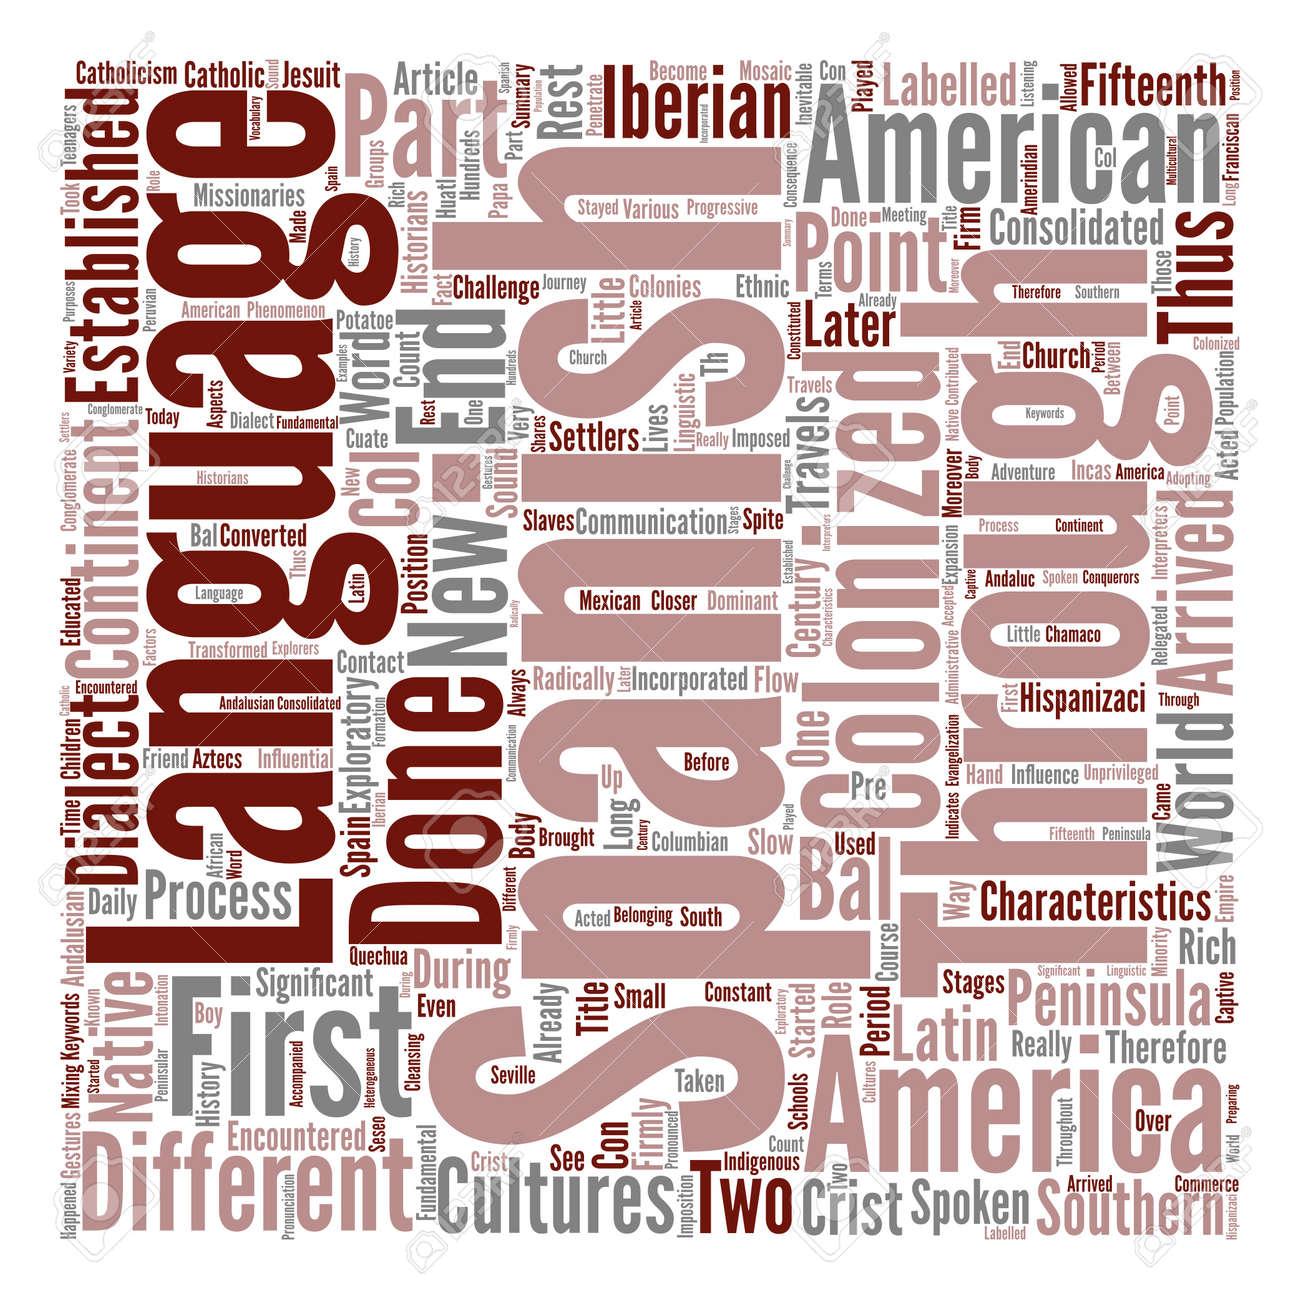 Historia De La Lengua Espanola En America Latina Texto Fondo Palabra Nube Concepto